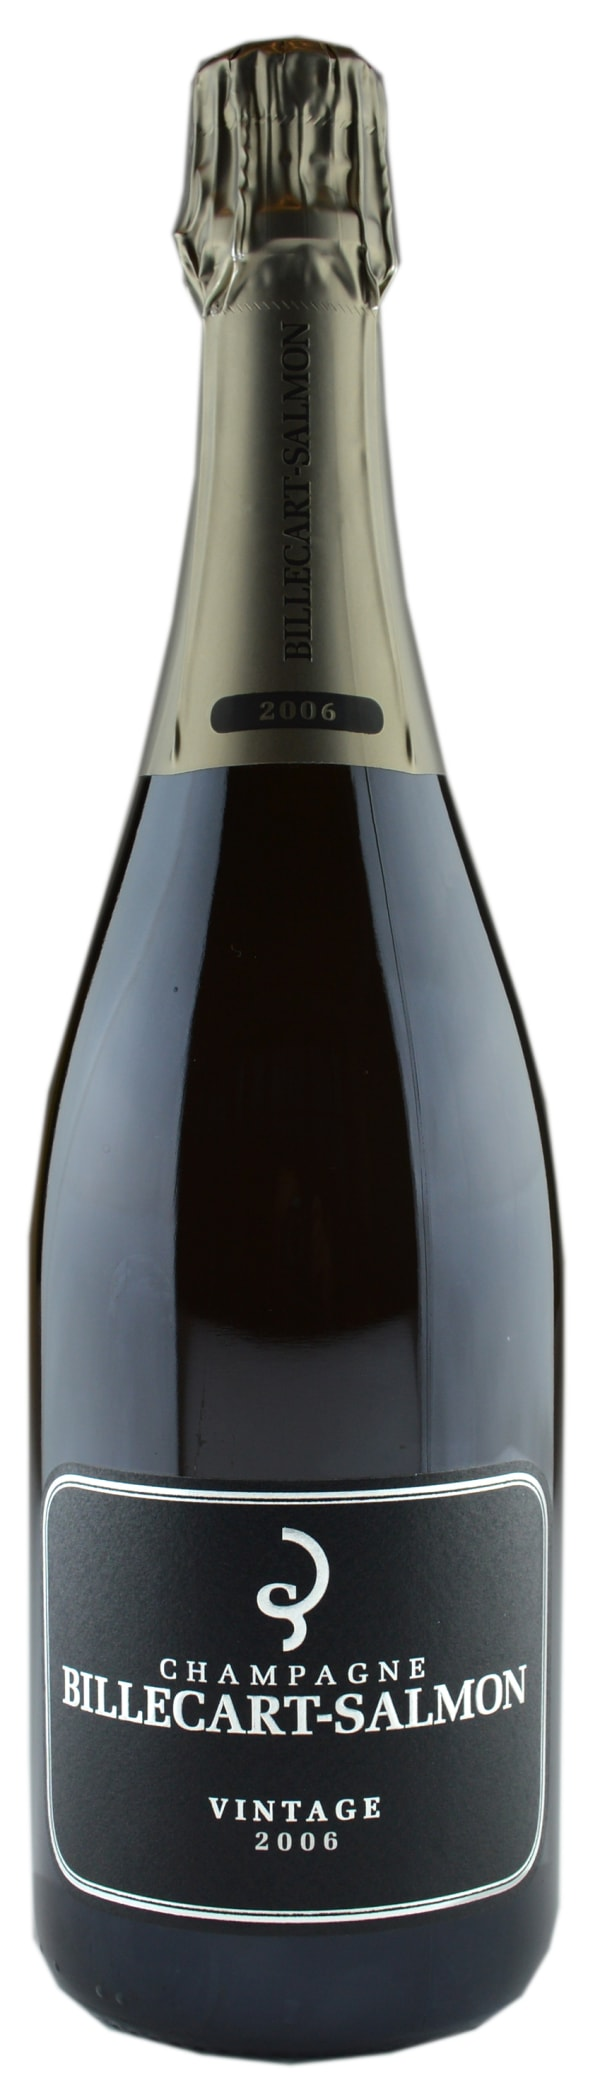 Billecart-Salmon Vintage Champagne Extra Brut  2008